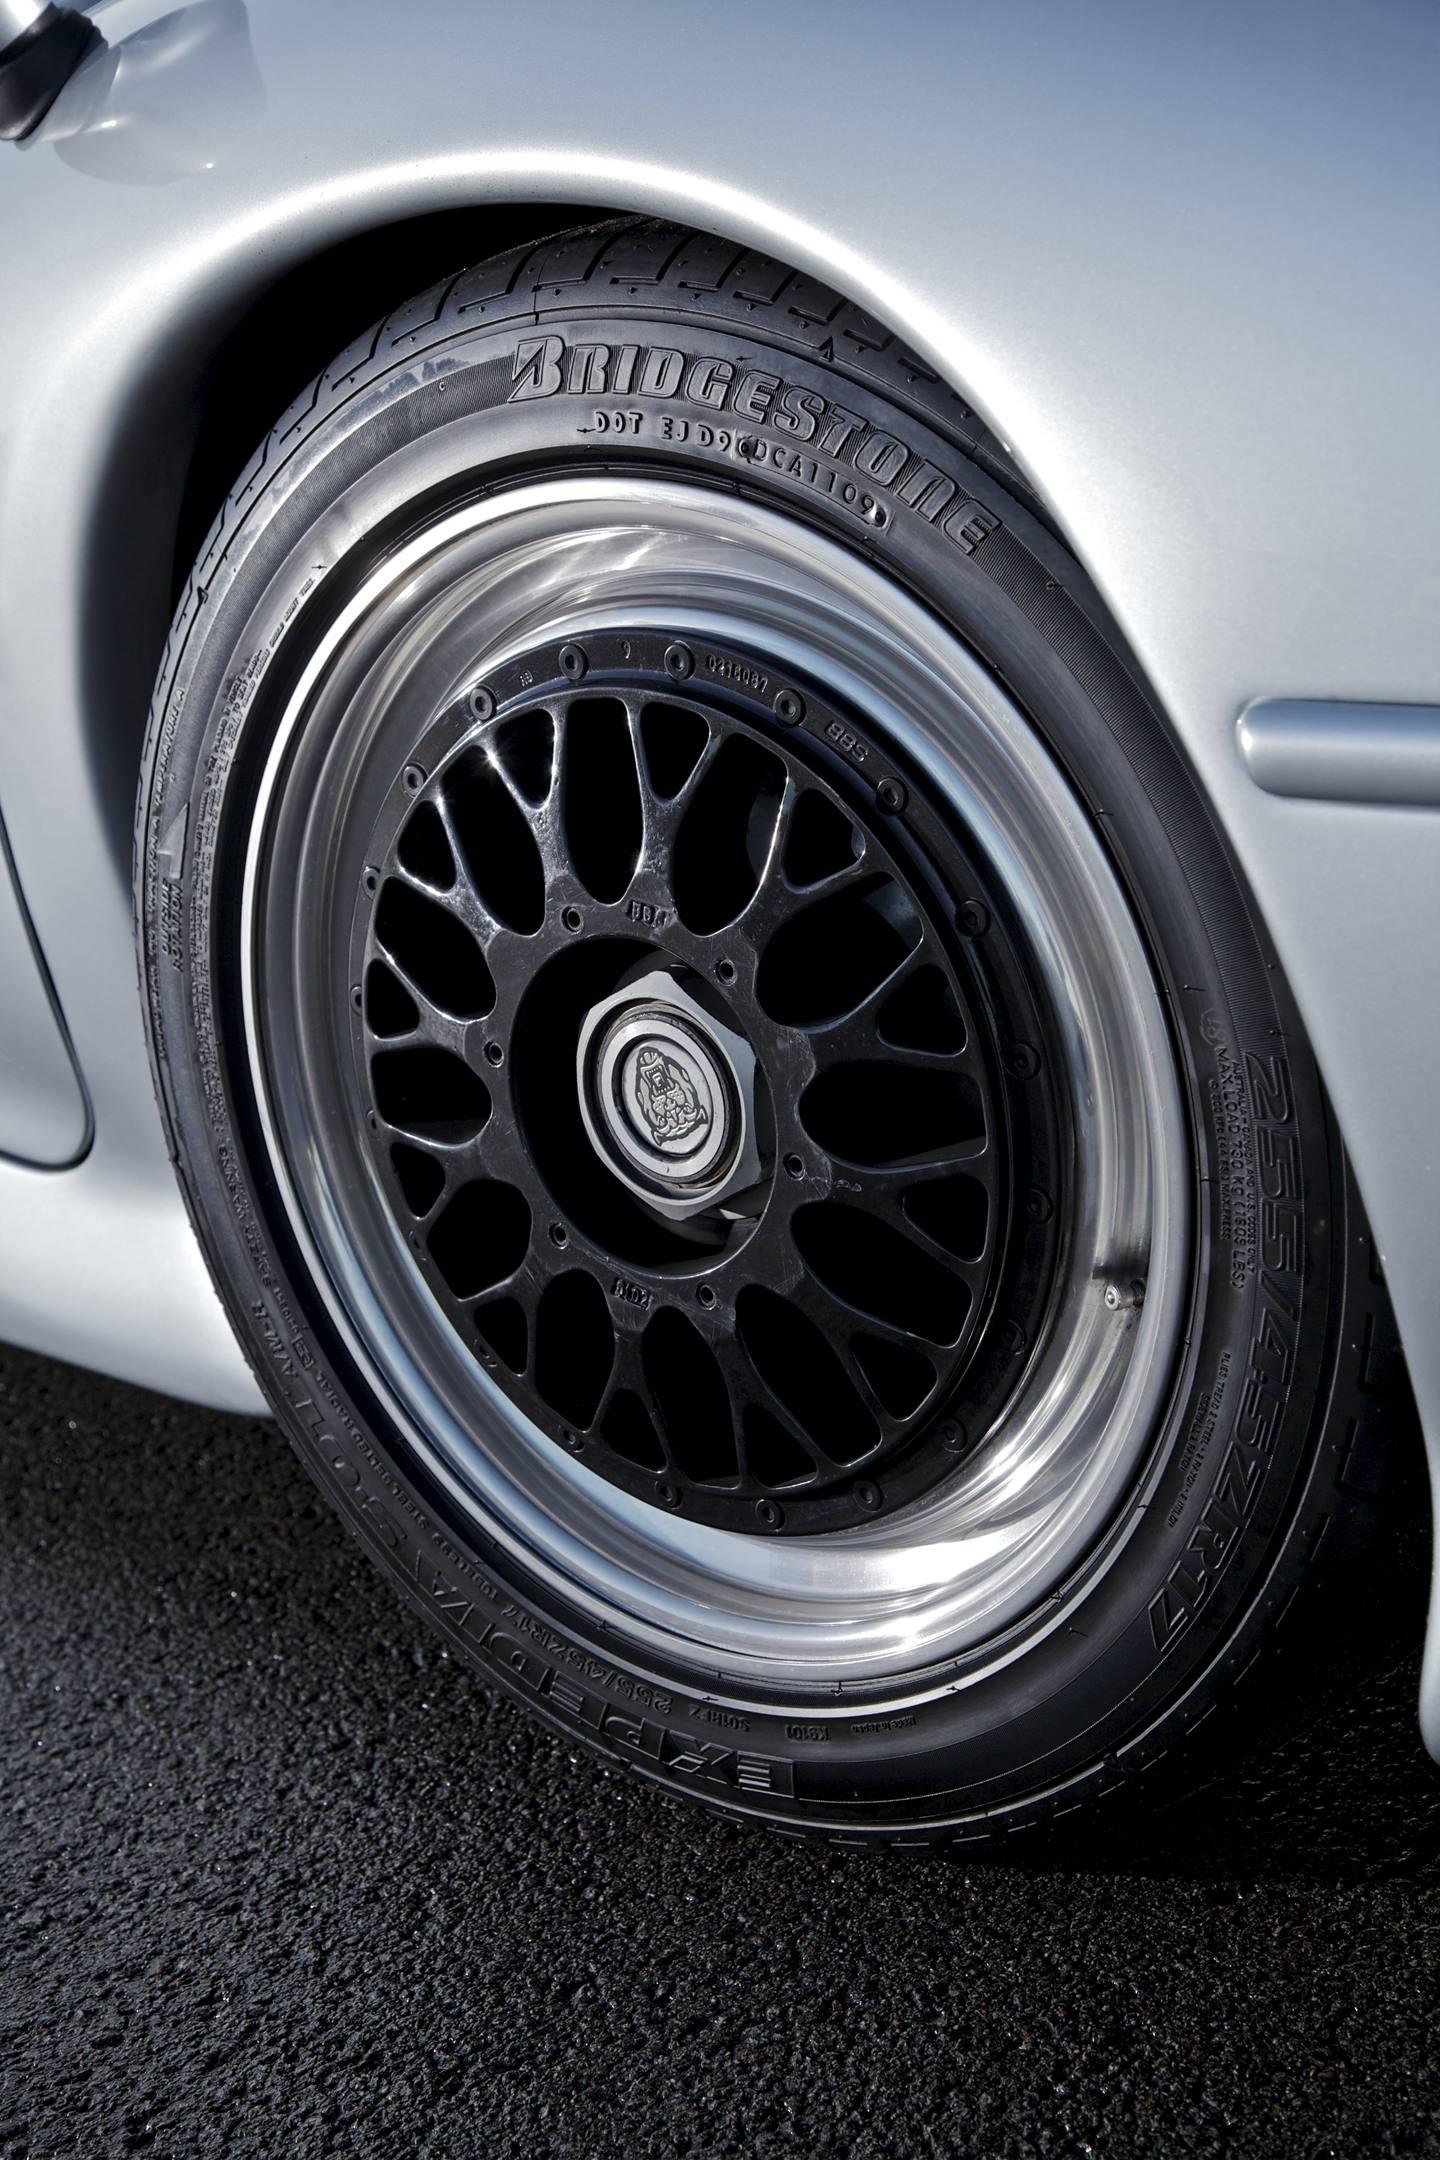 Jaguar XJ220 wheel detail